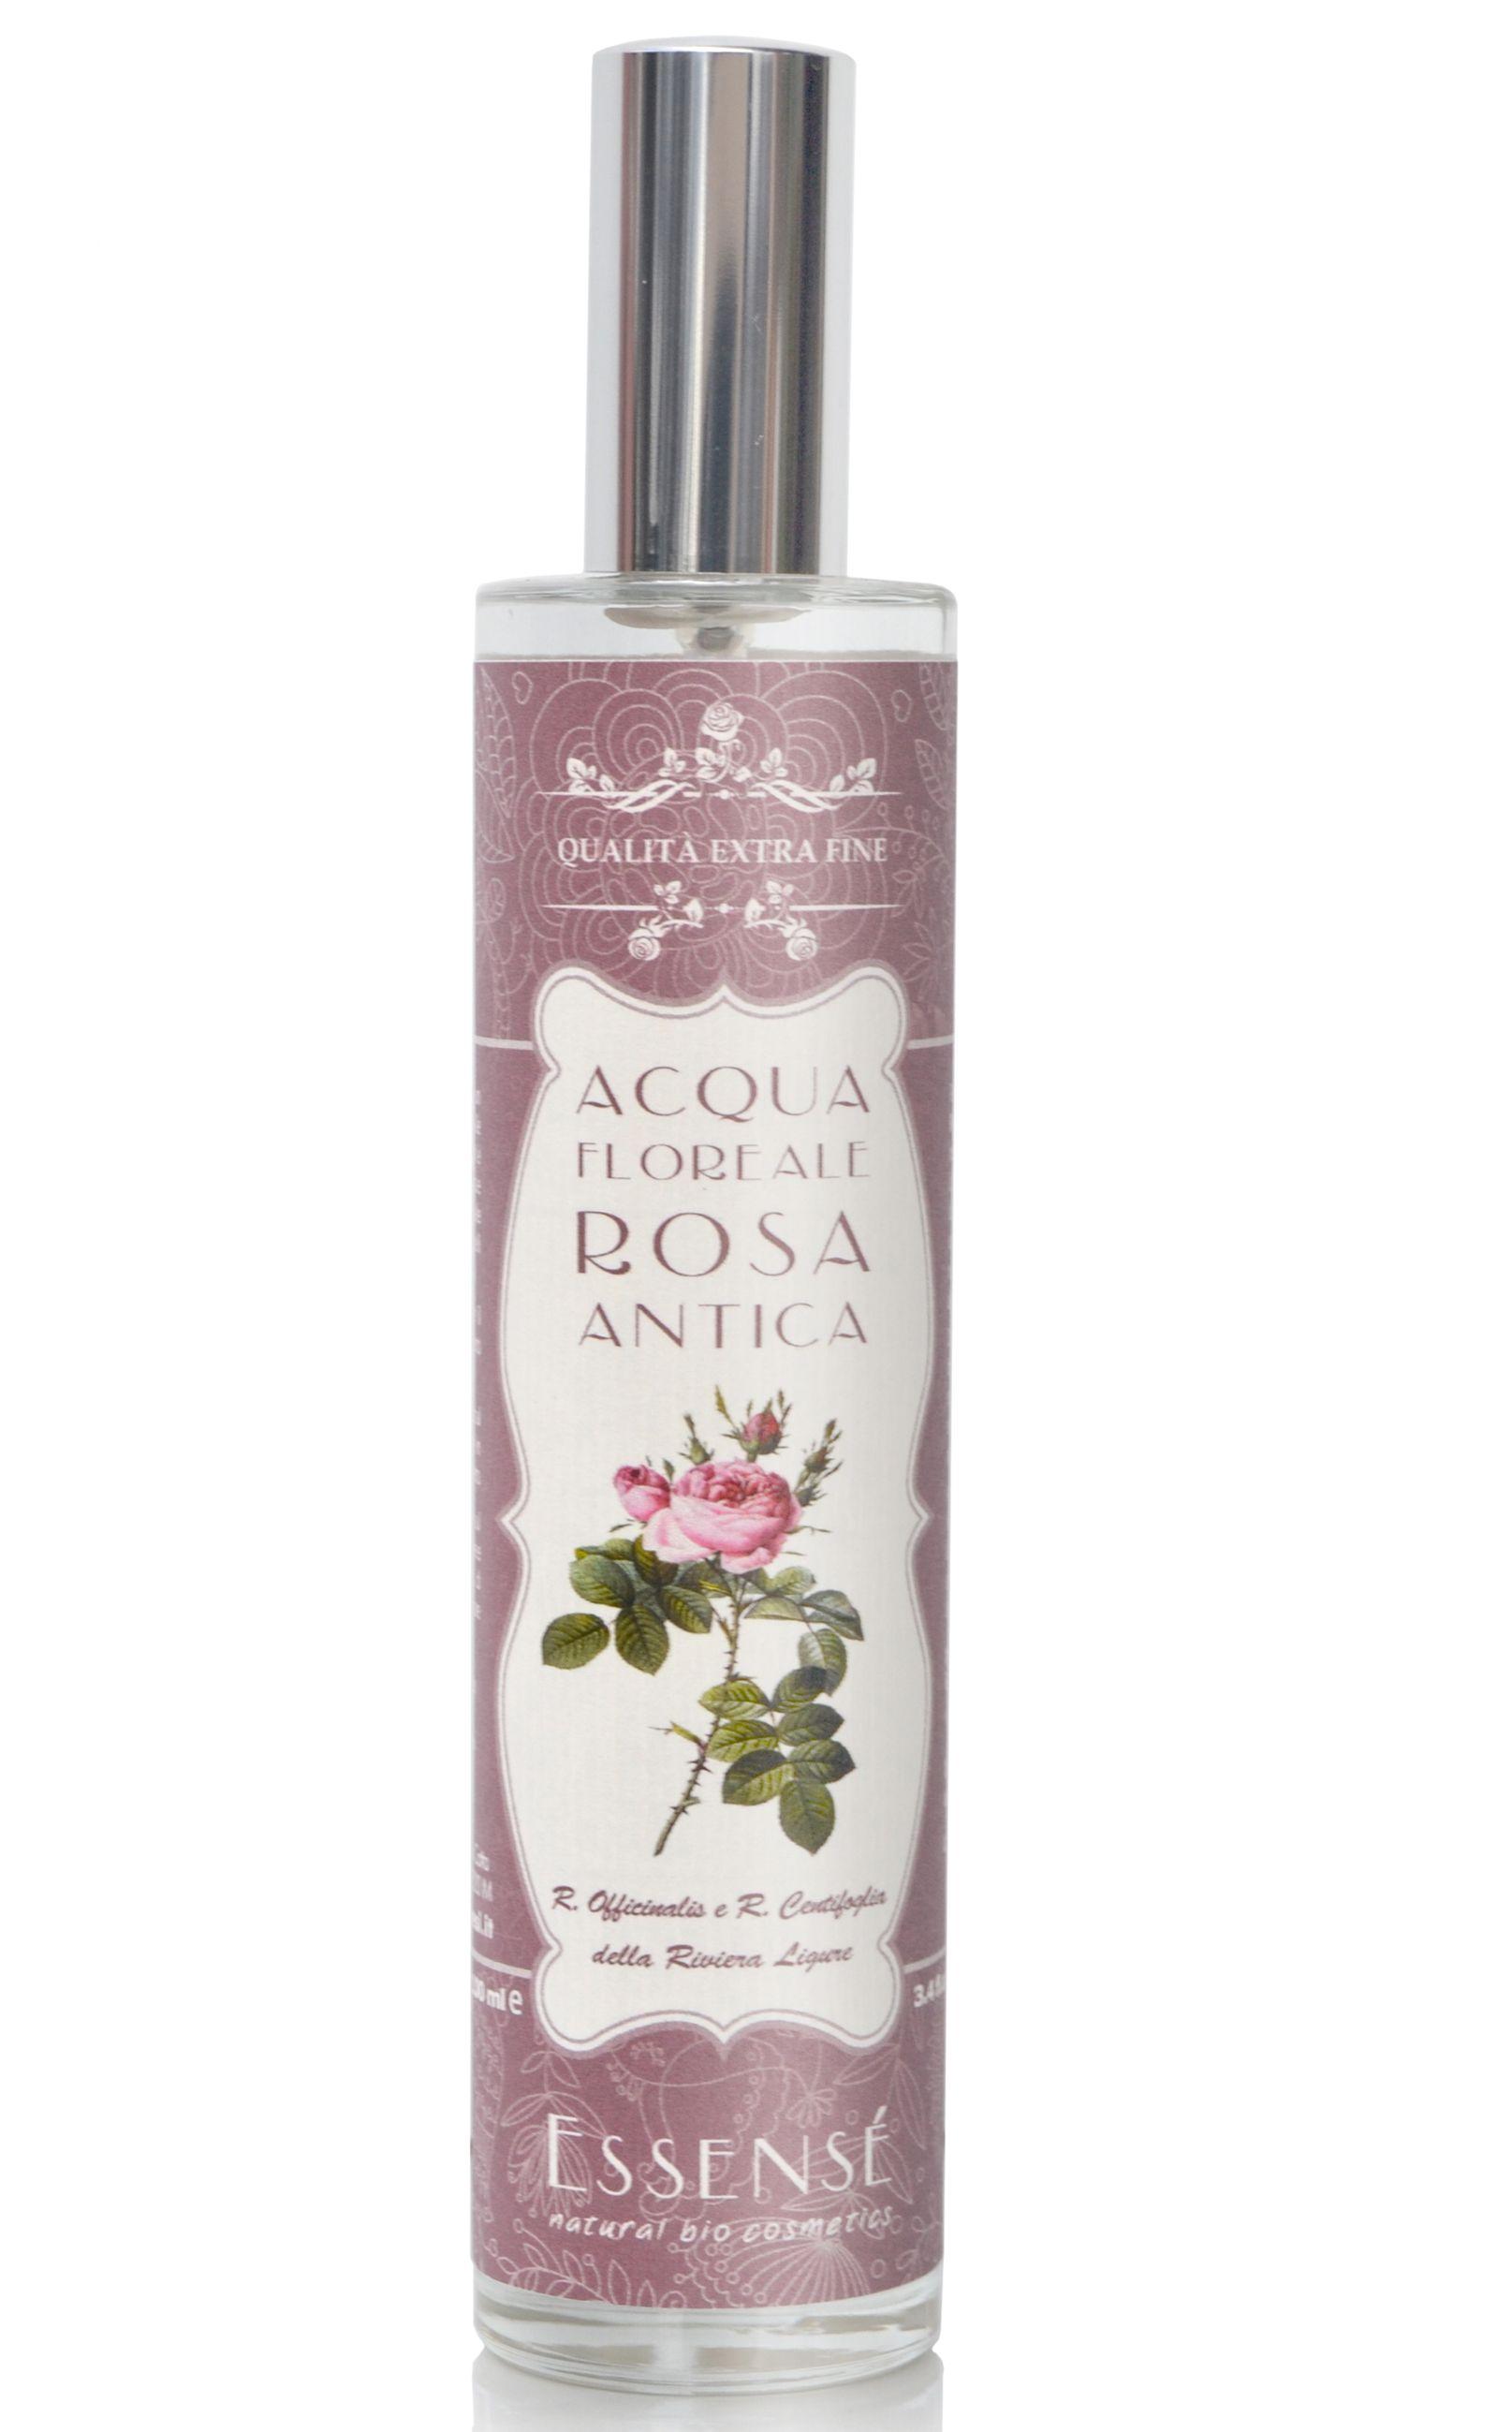 Essensé Biocosmesi - Acqua Floreale di Rosa Antica